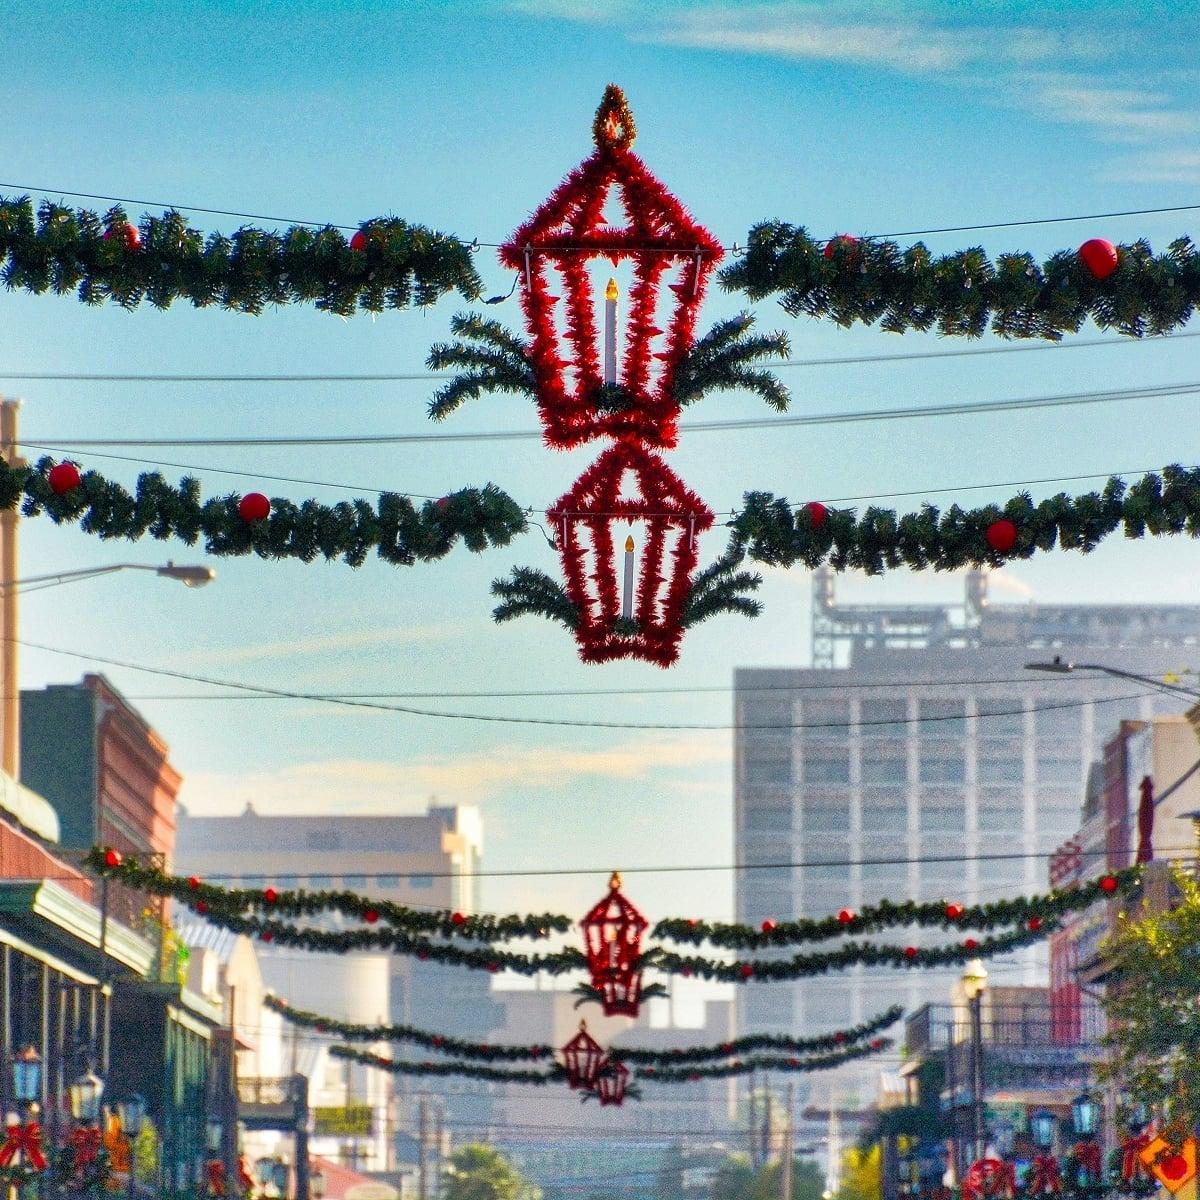 Historic Galveston Island Christmas